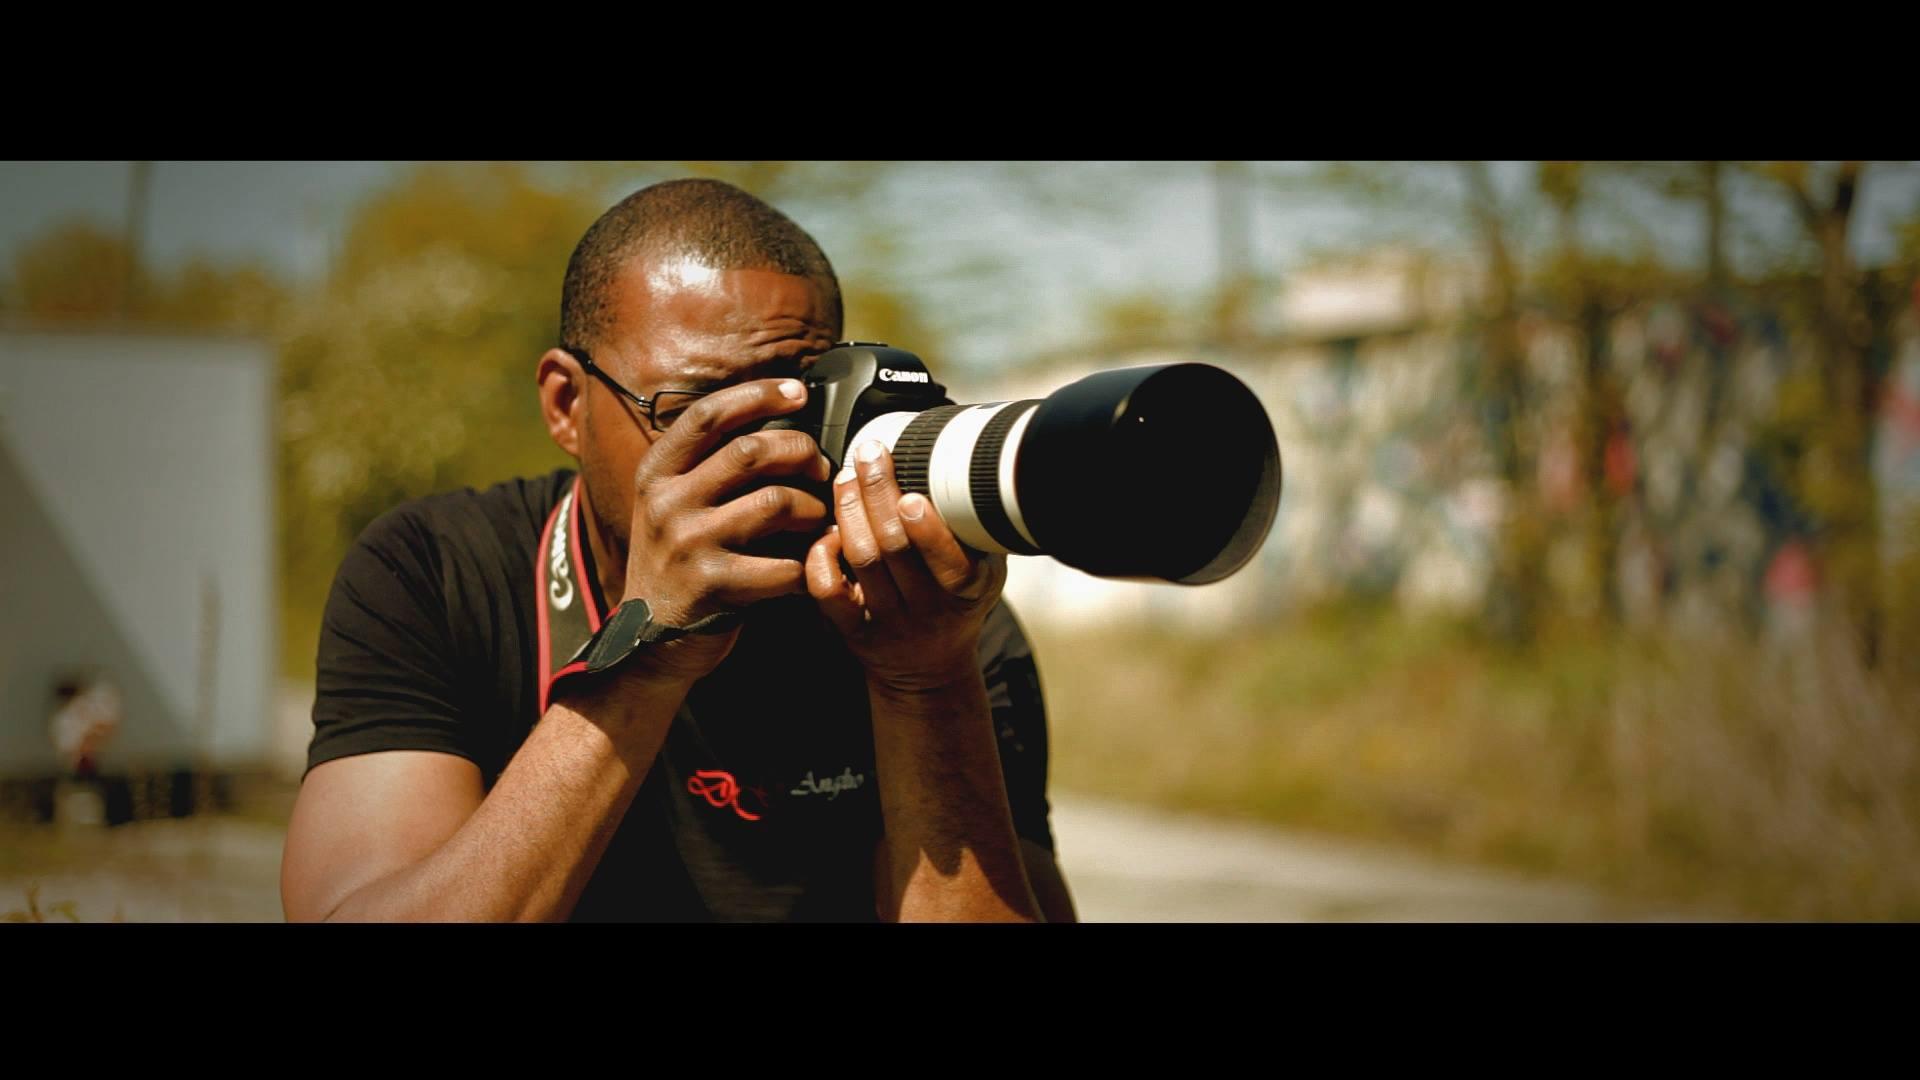 photographe professionnel dg anglio photo